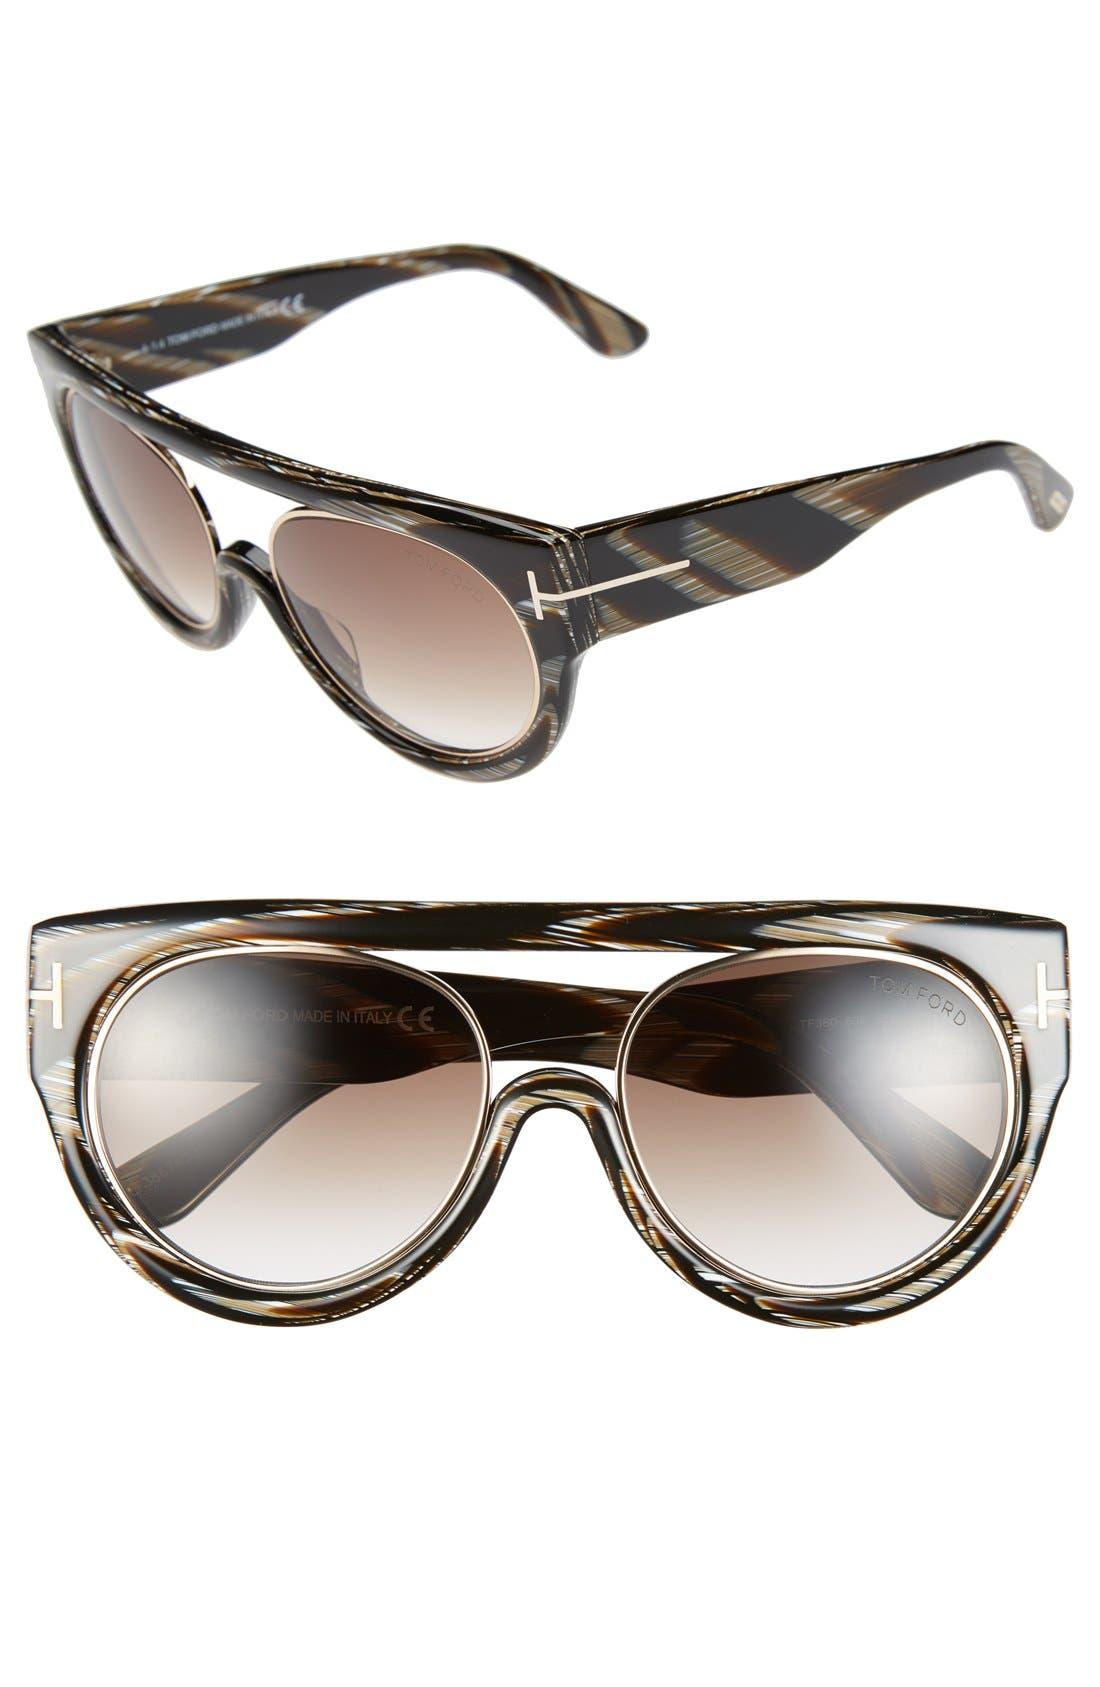 Main Image - Tom Ford 'Alana' 55mm Modified Aviator Sunglasses